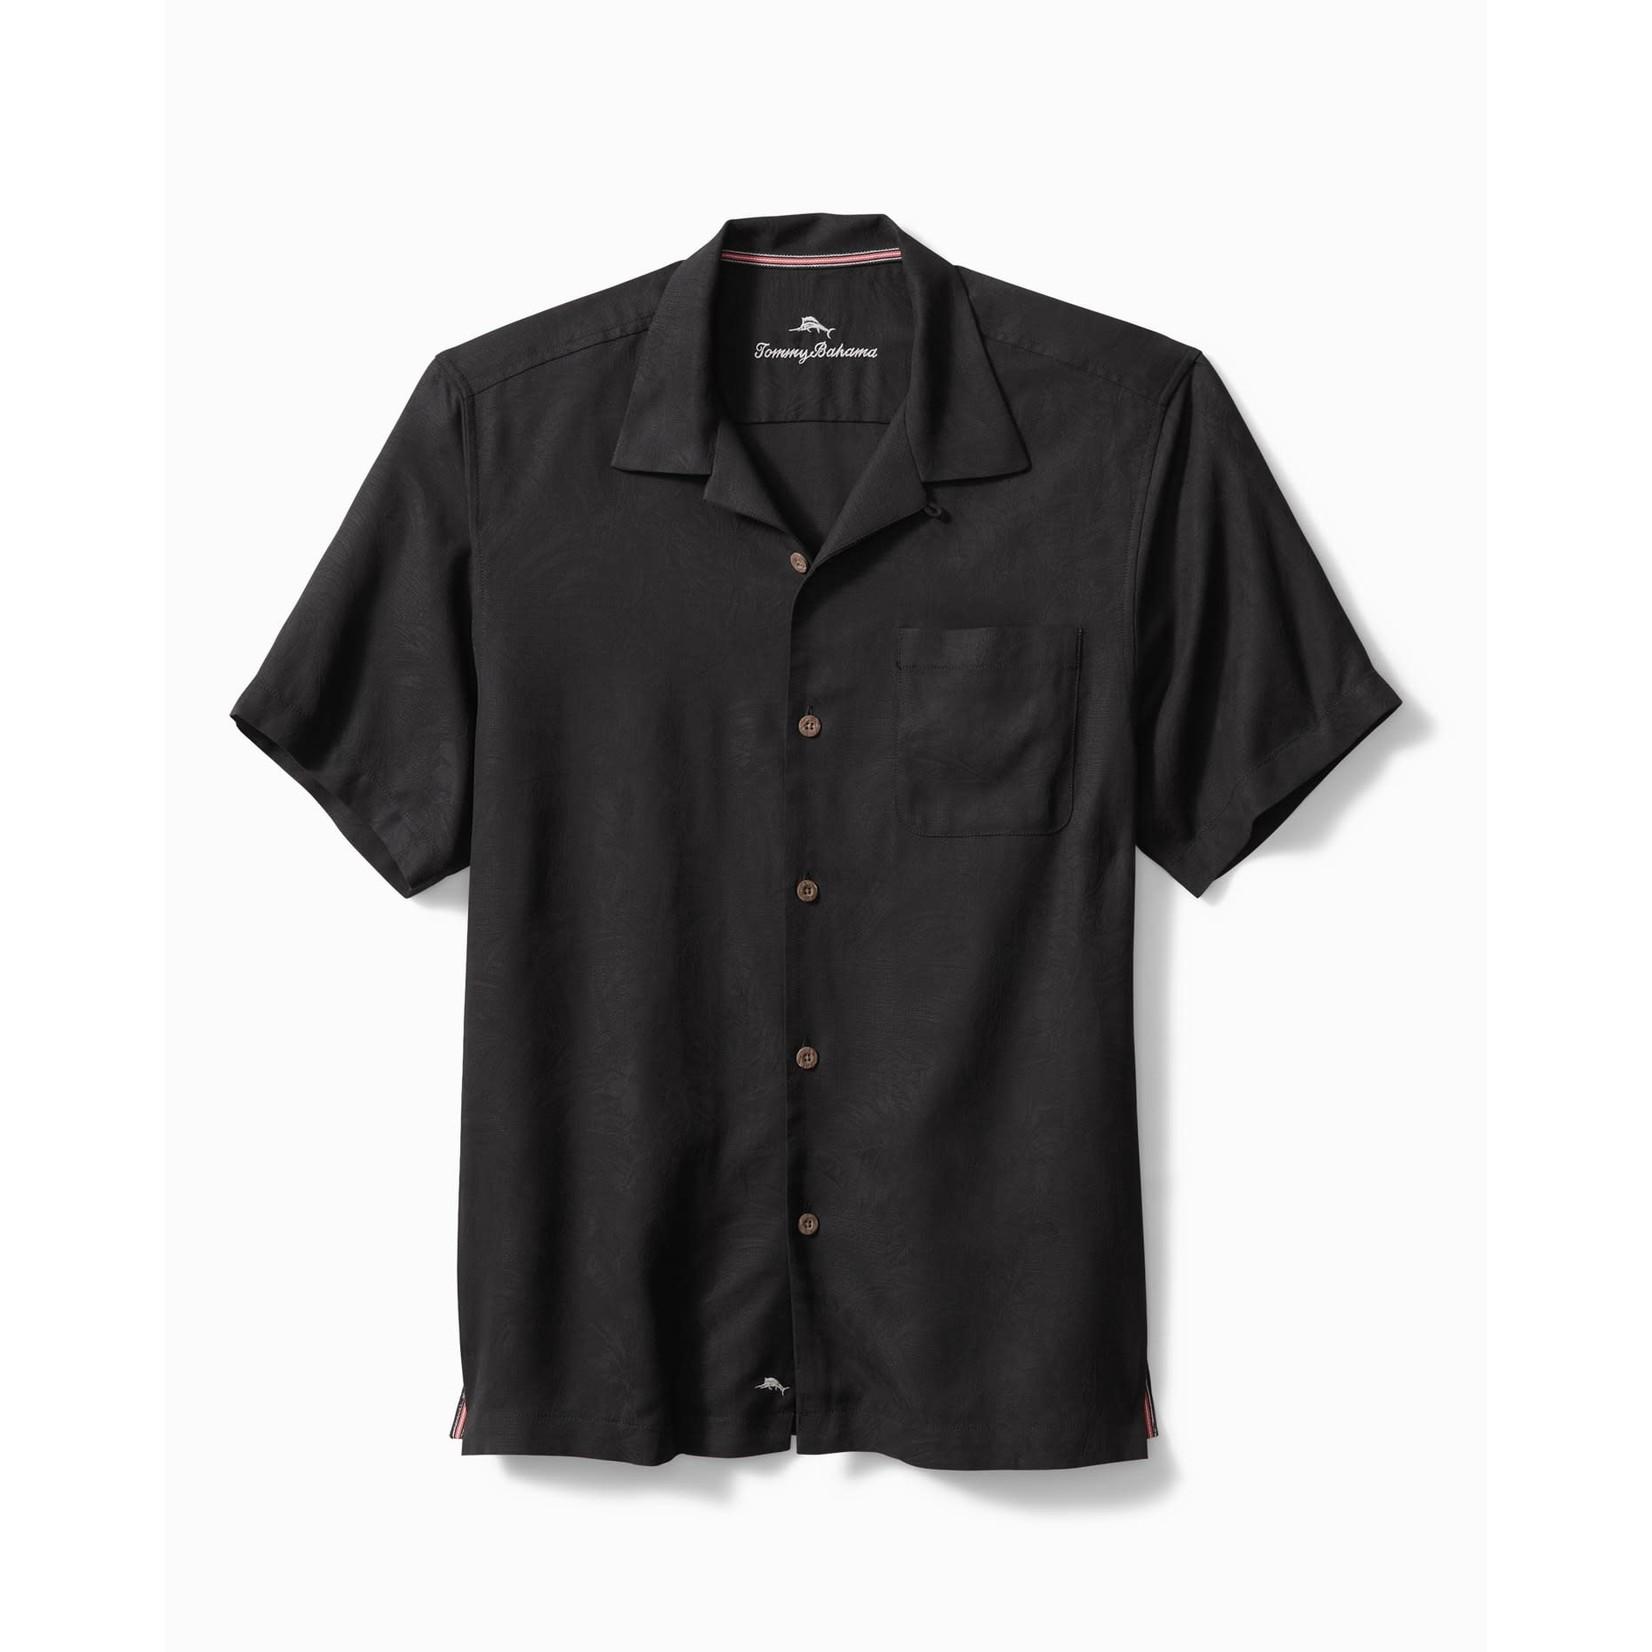 Tommy Bahama Tropic Isles Shirt *2 Colors*